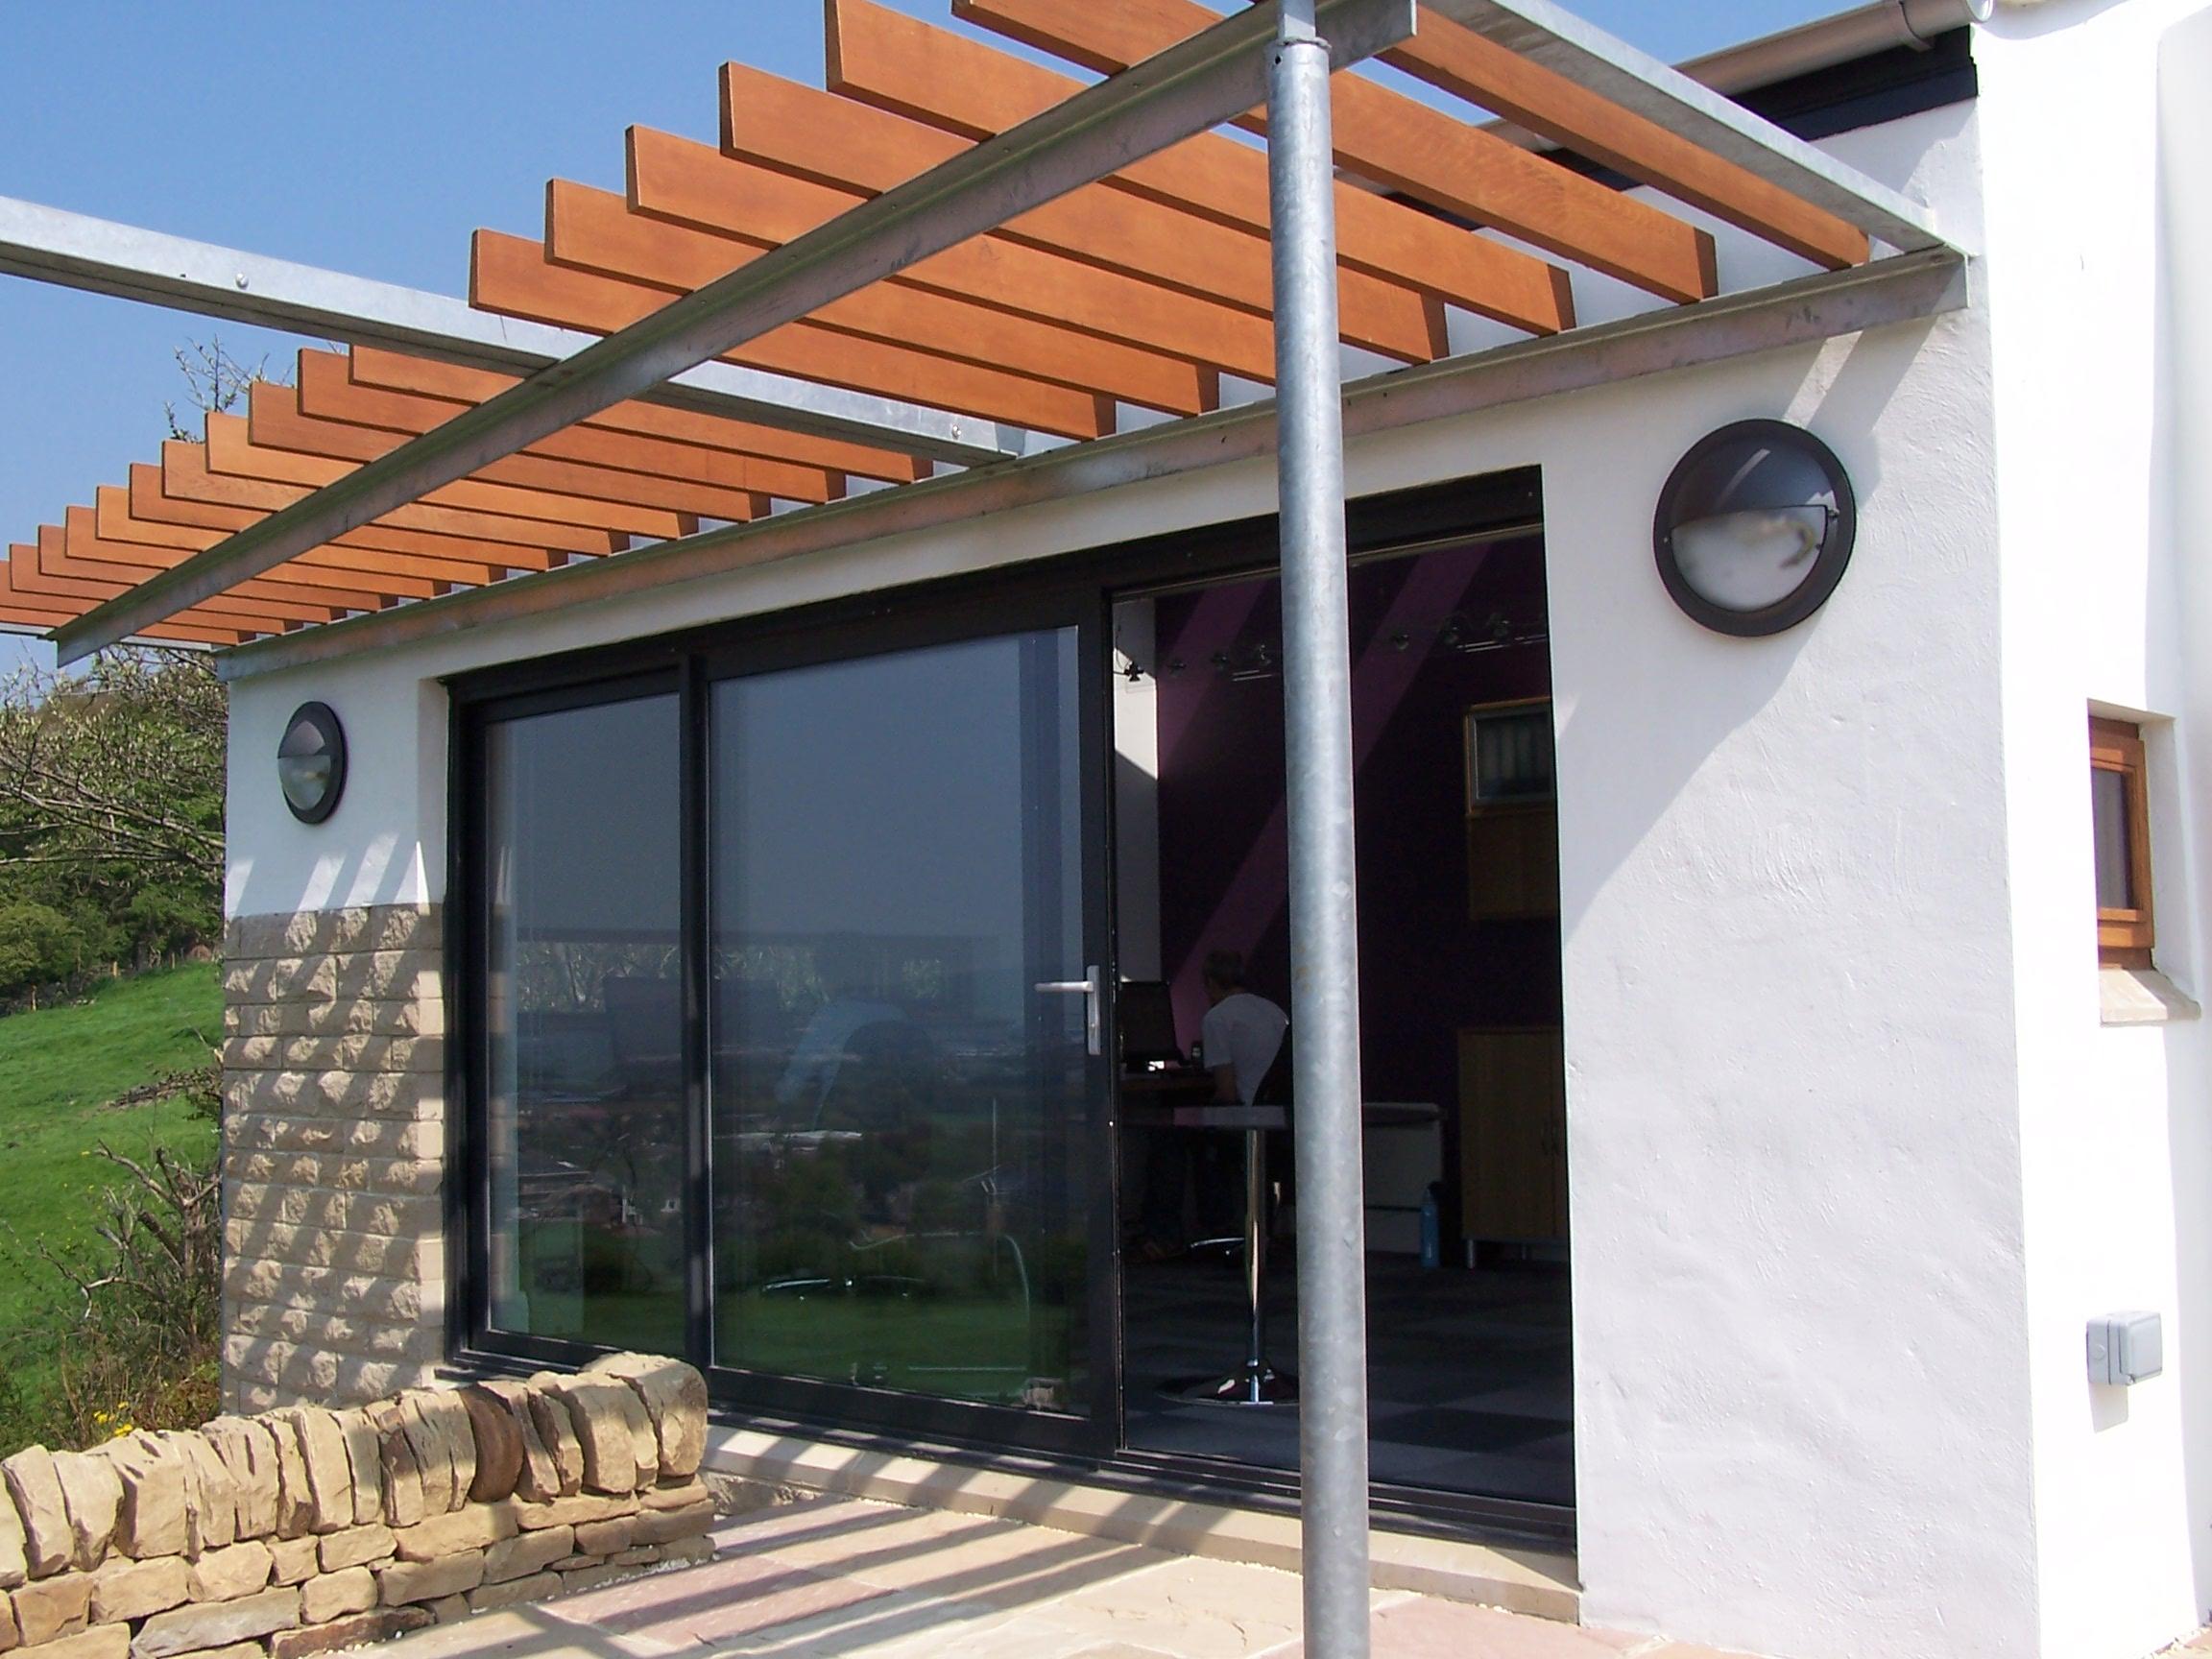 Merrell O'Flaherty Dormer Architects